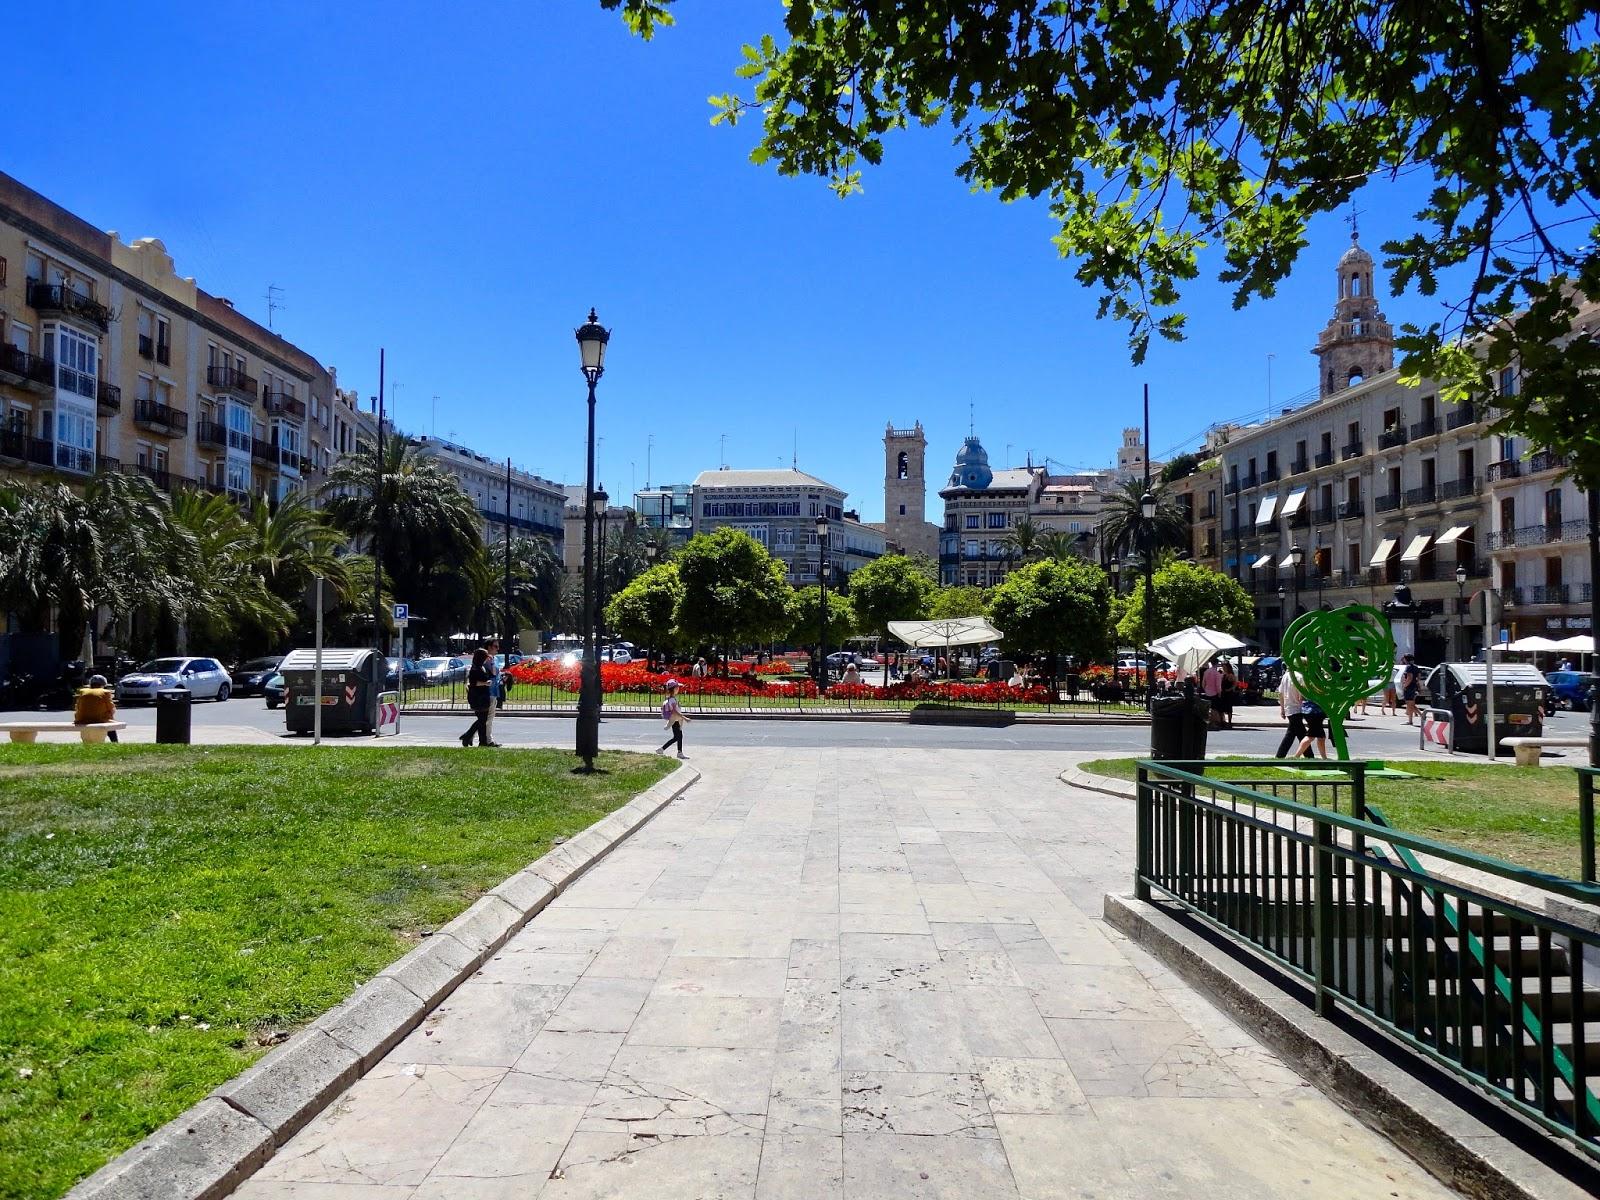 plaza valencia spain blue sky architecture